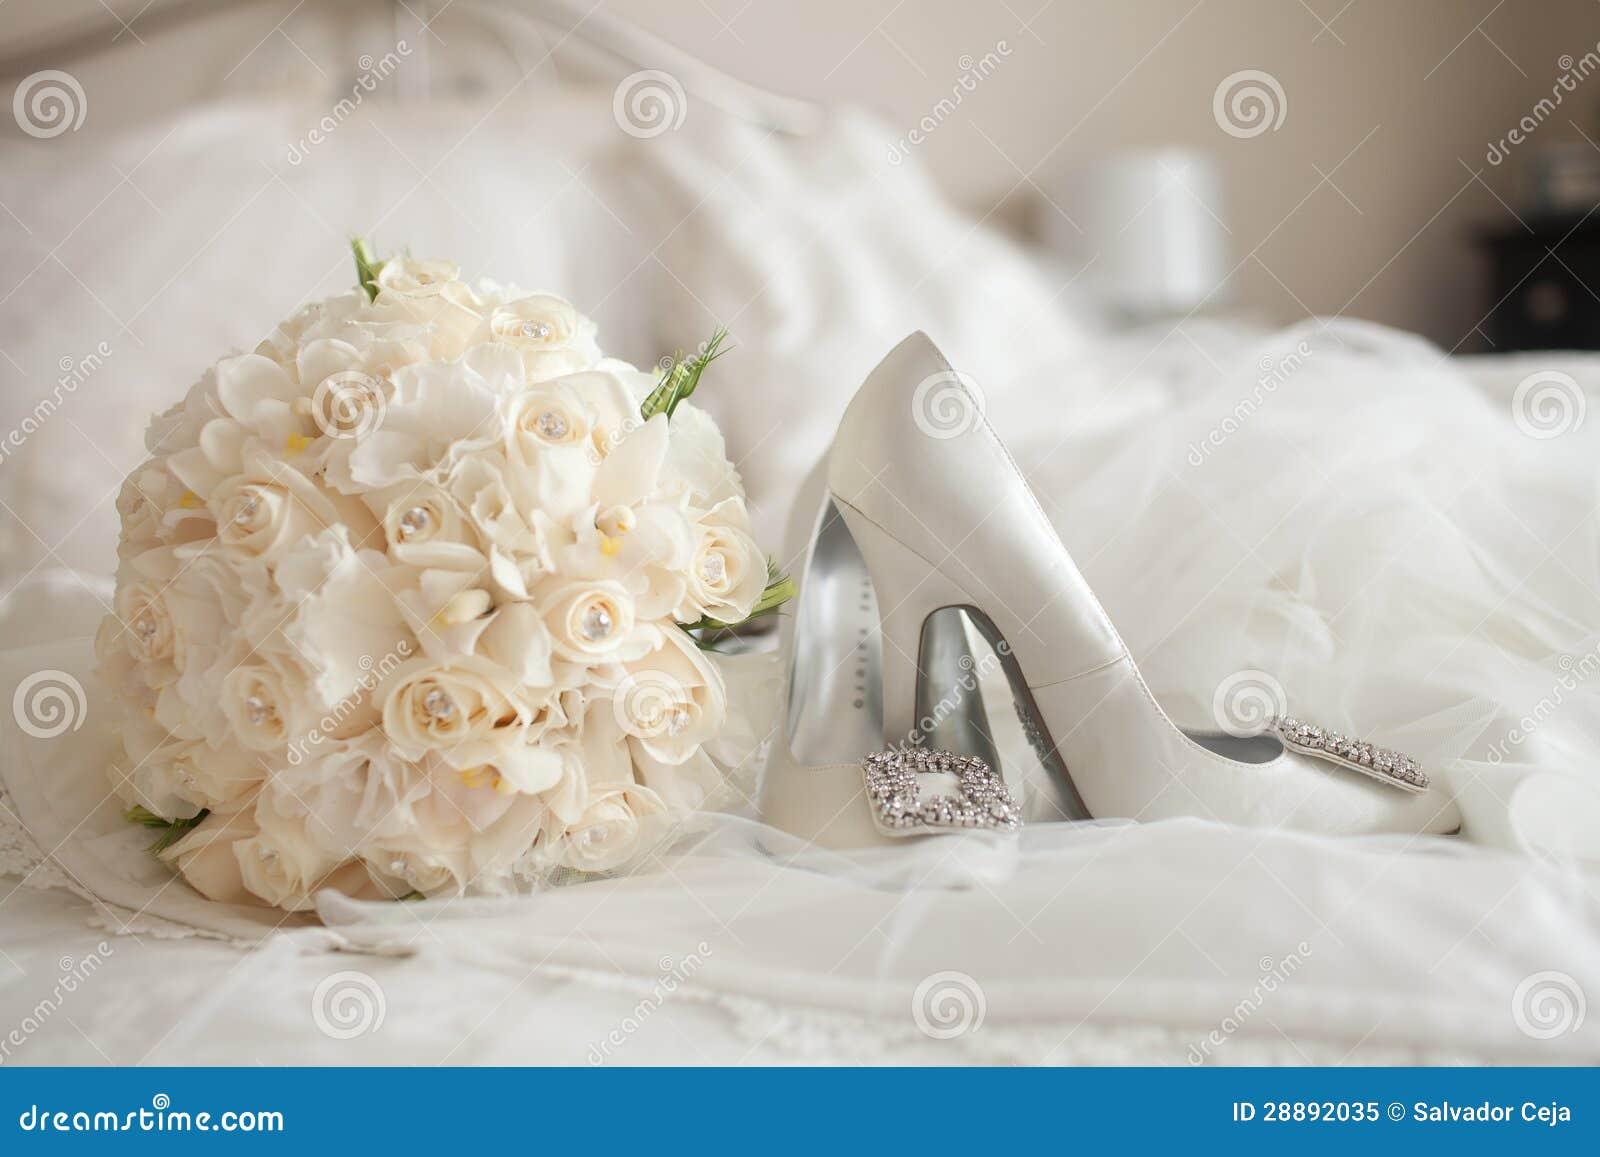 Wedding Bouquet Of White Roses Wedding Shoes white rose